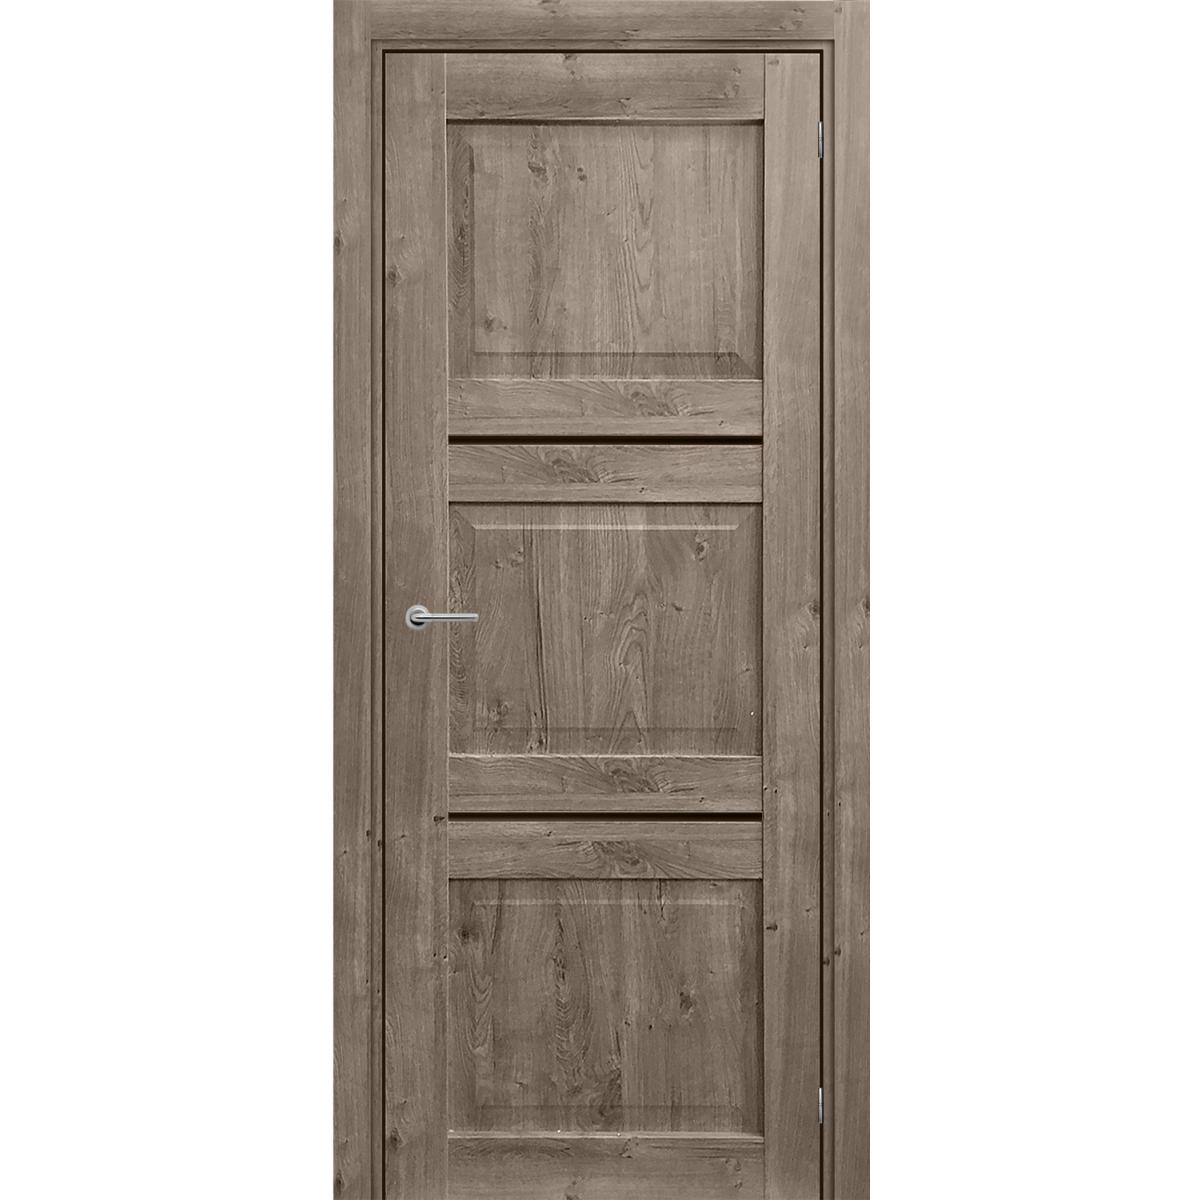 Дверь Межкомнатная Гранде 90Х200 Цвет Берлин Cpl С Фурнитурой